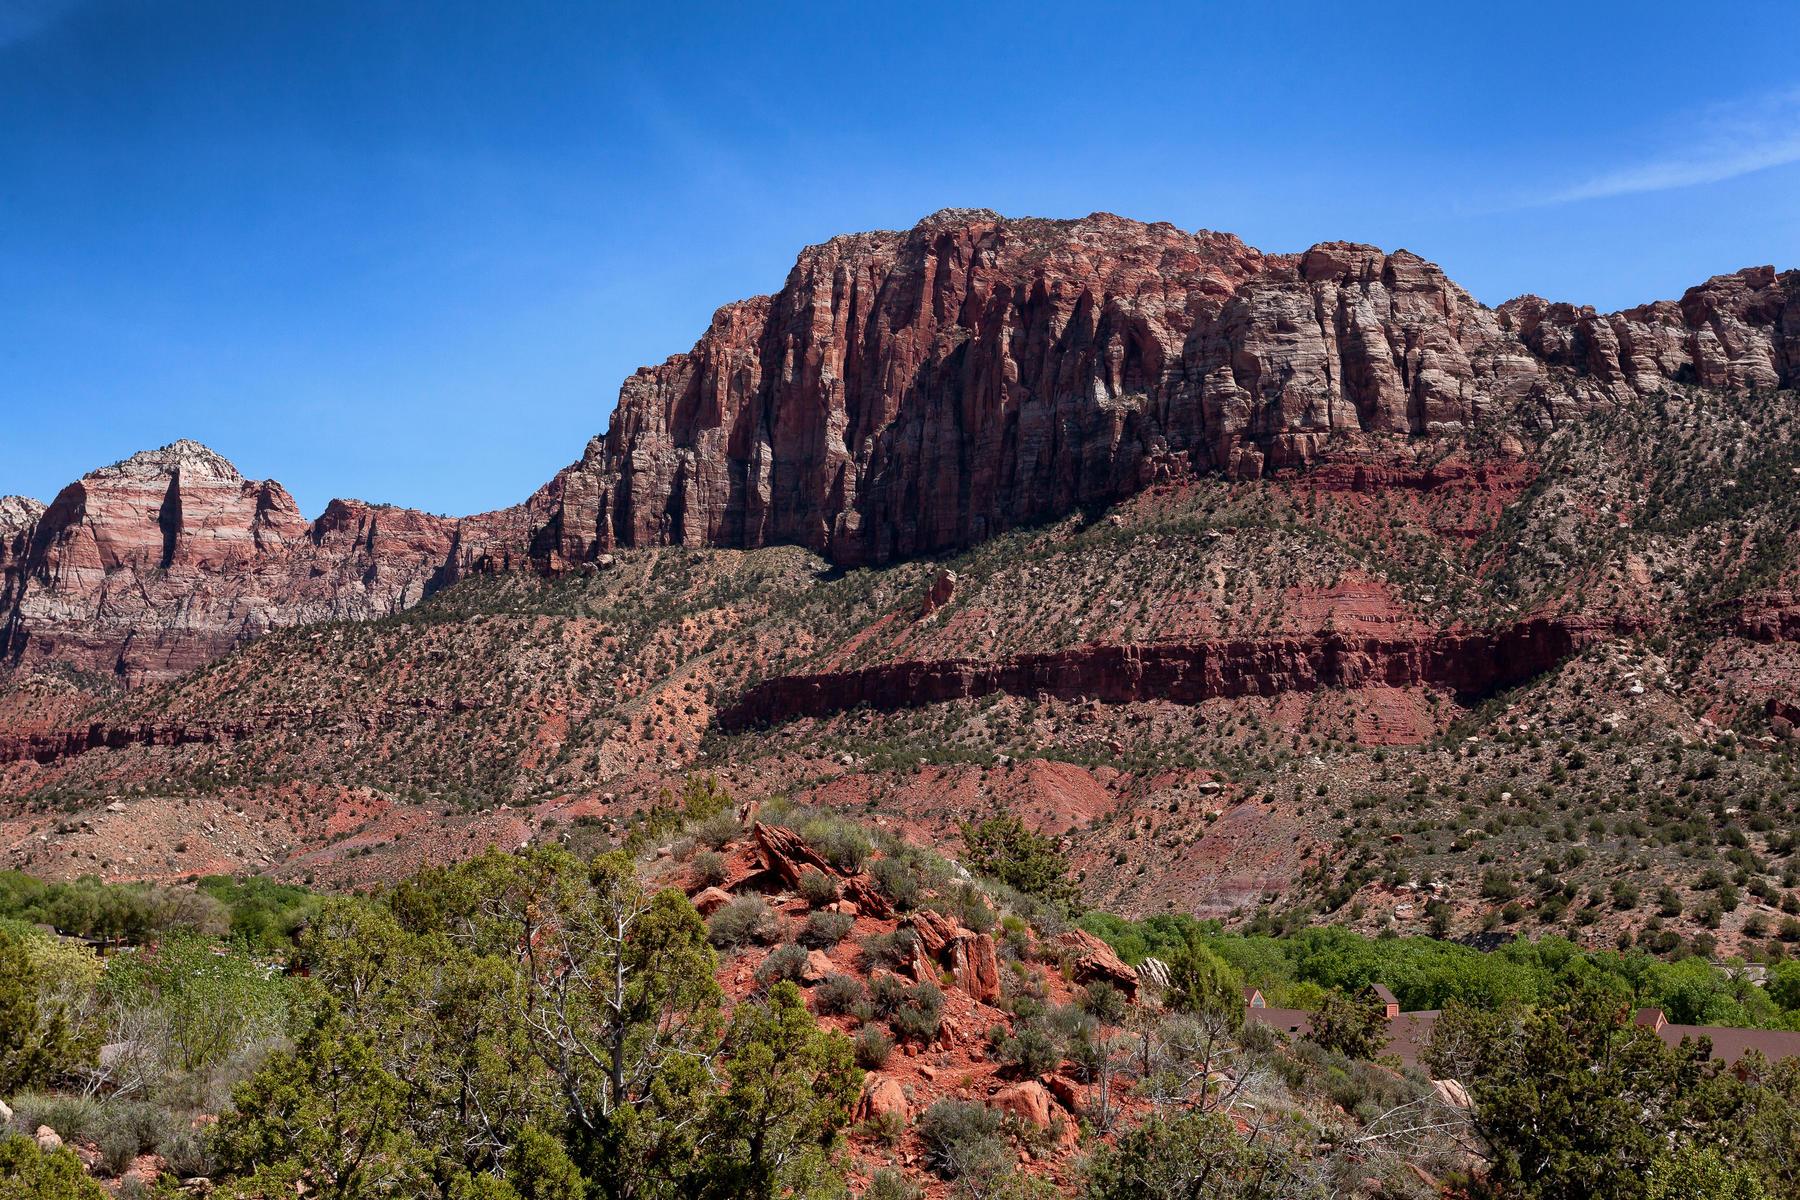 Land for Sale at ZION ACREAGE, SPRINGDALE, UT 20.25 Acres Springdale Springdale, Utah, 84767 United States